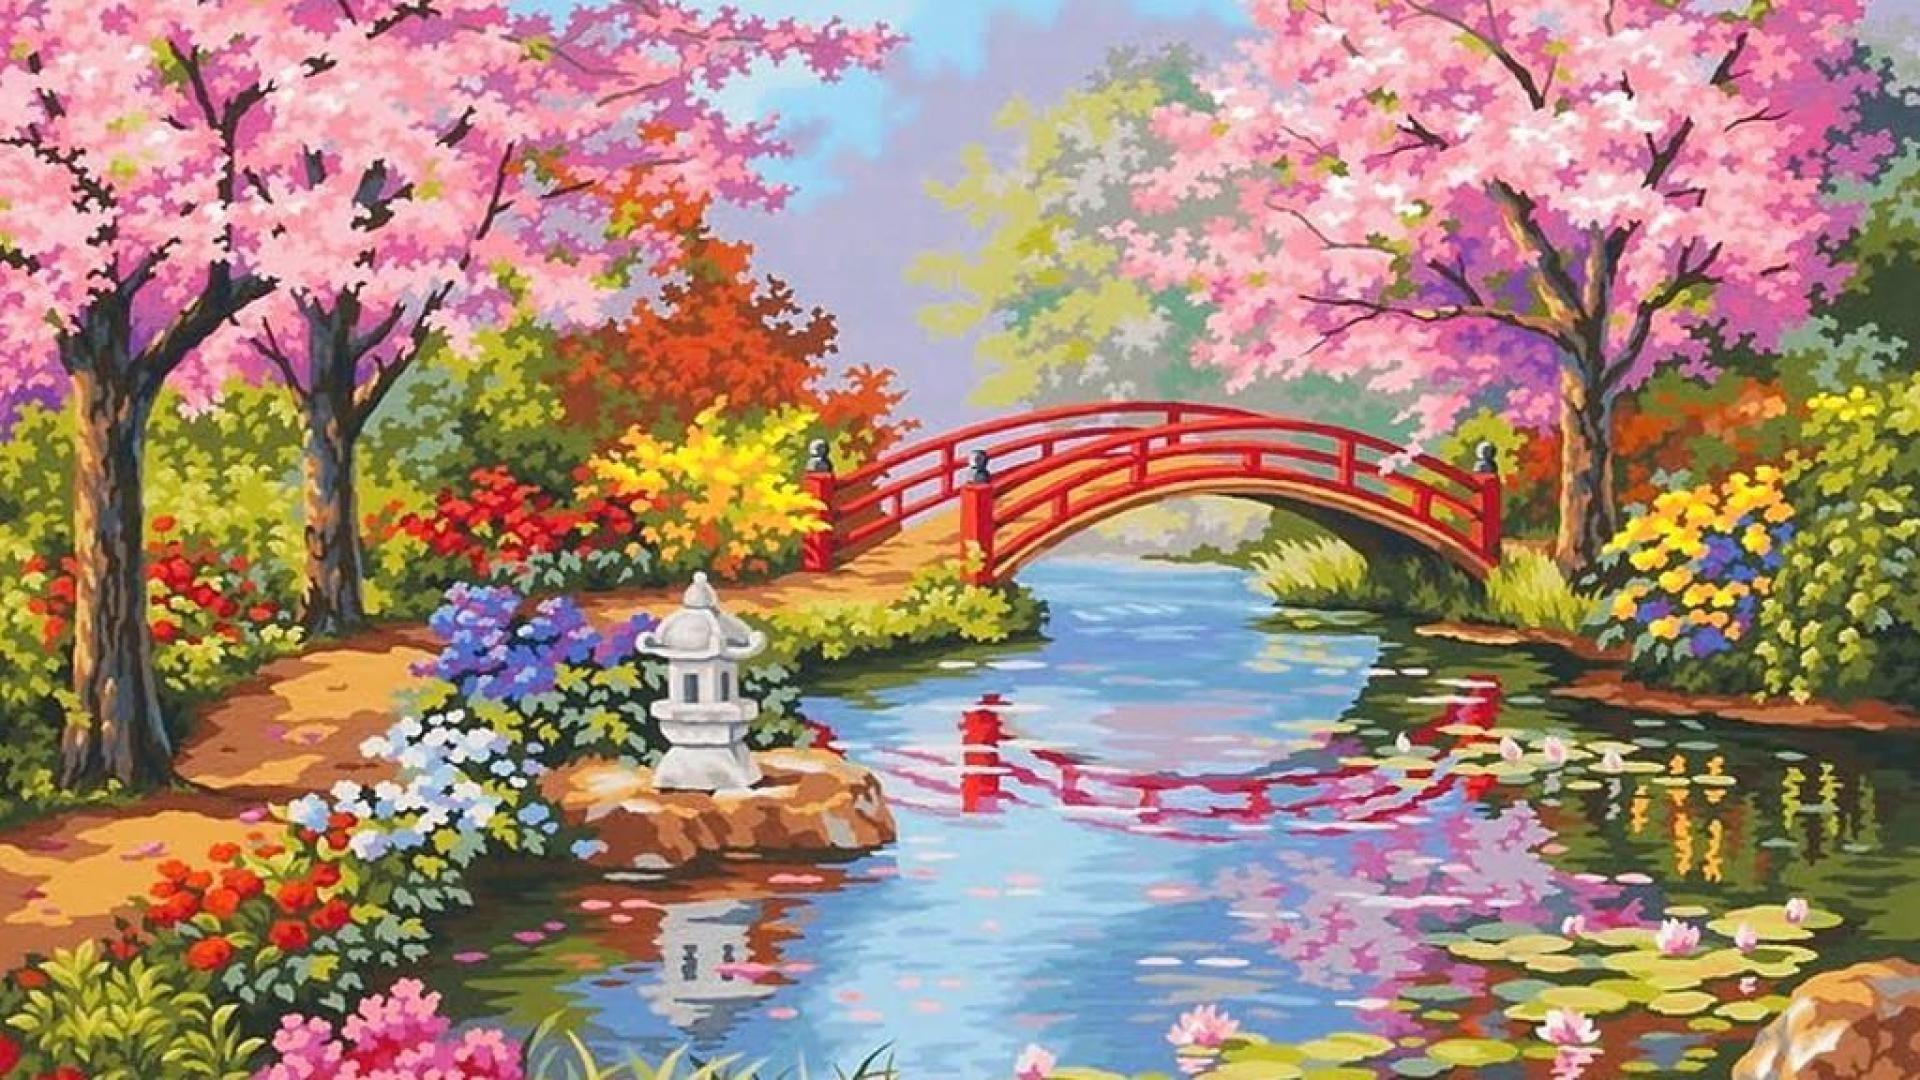 Genial Beautiful Flower Garden Paintings | Flower Garden Wallpapers   Wallpaper  Cave